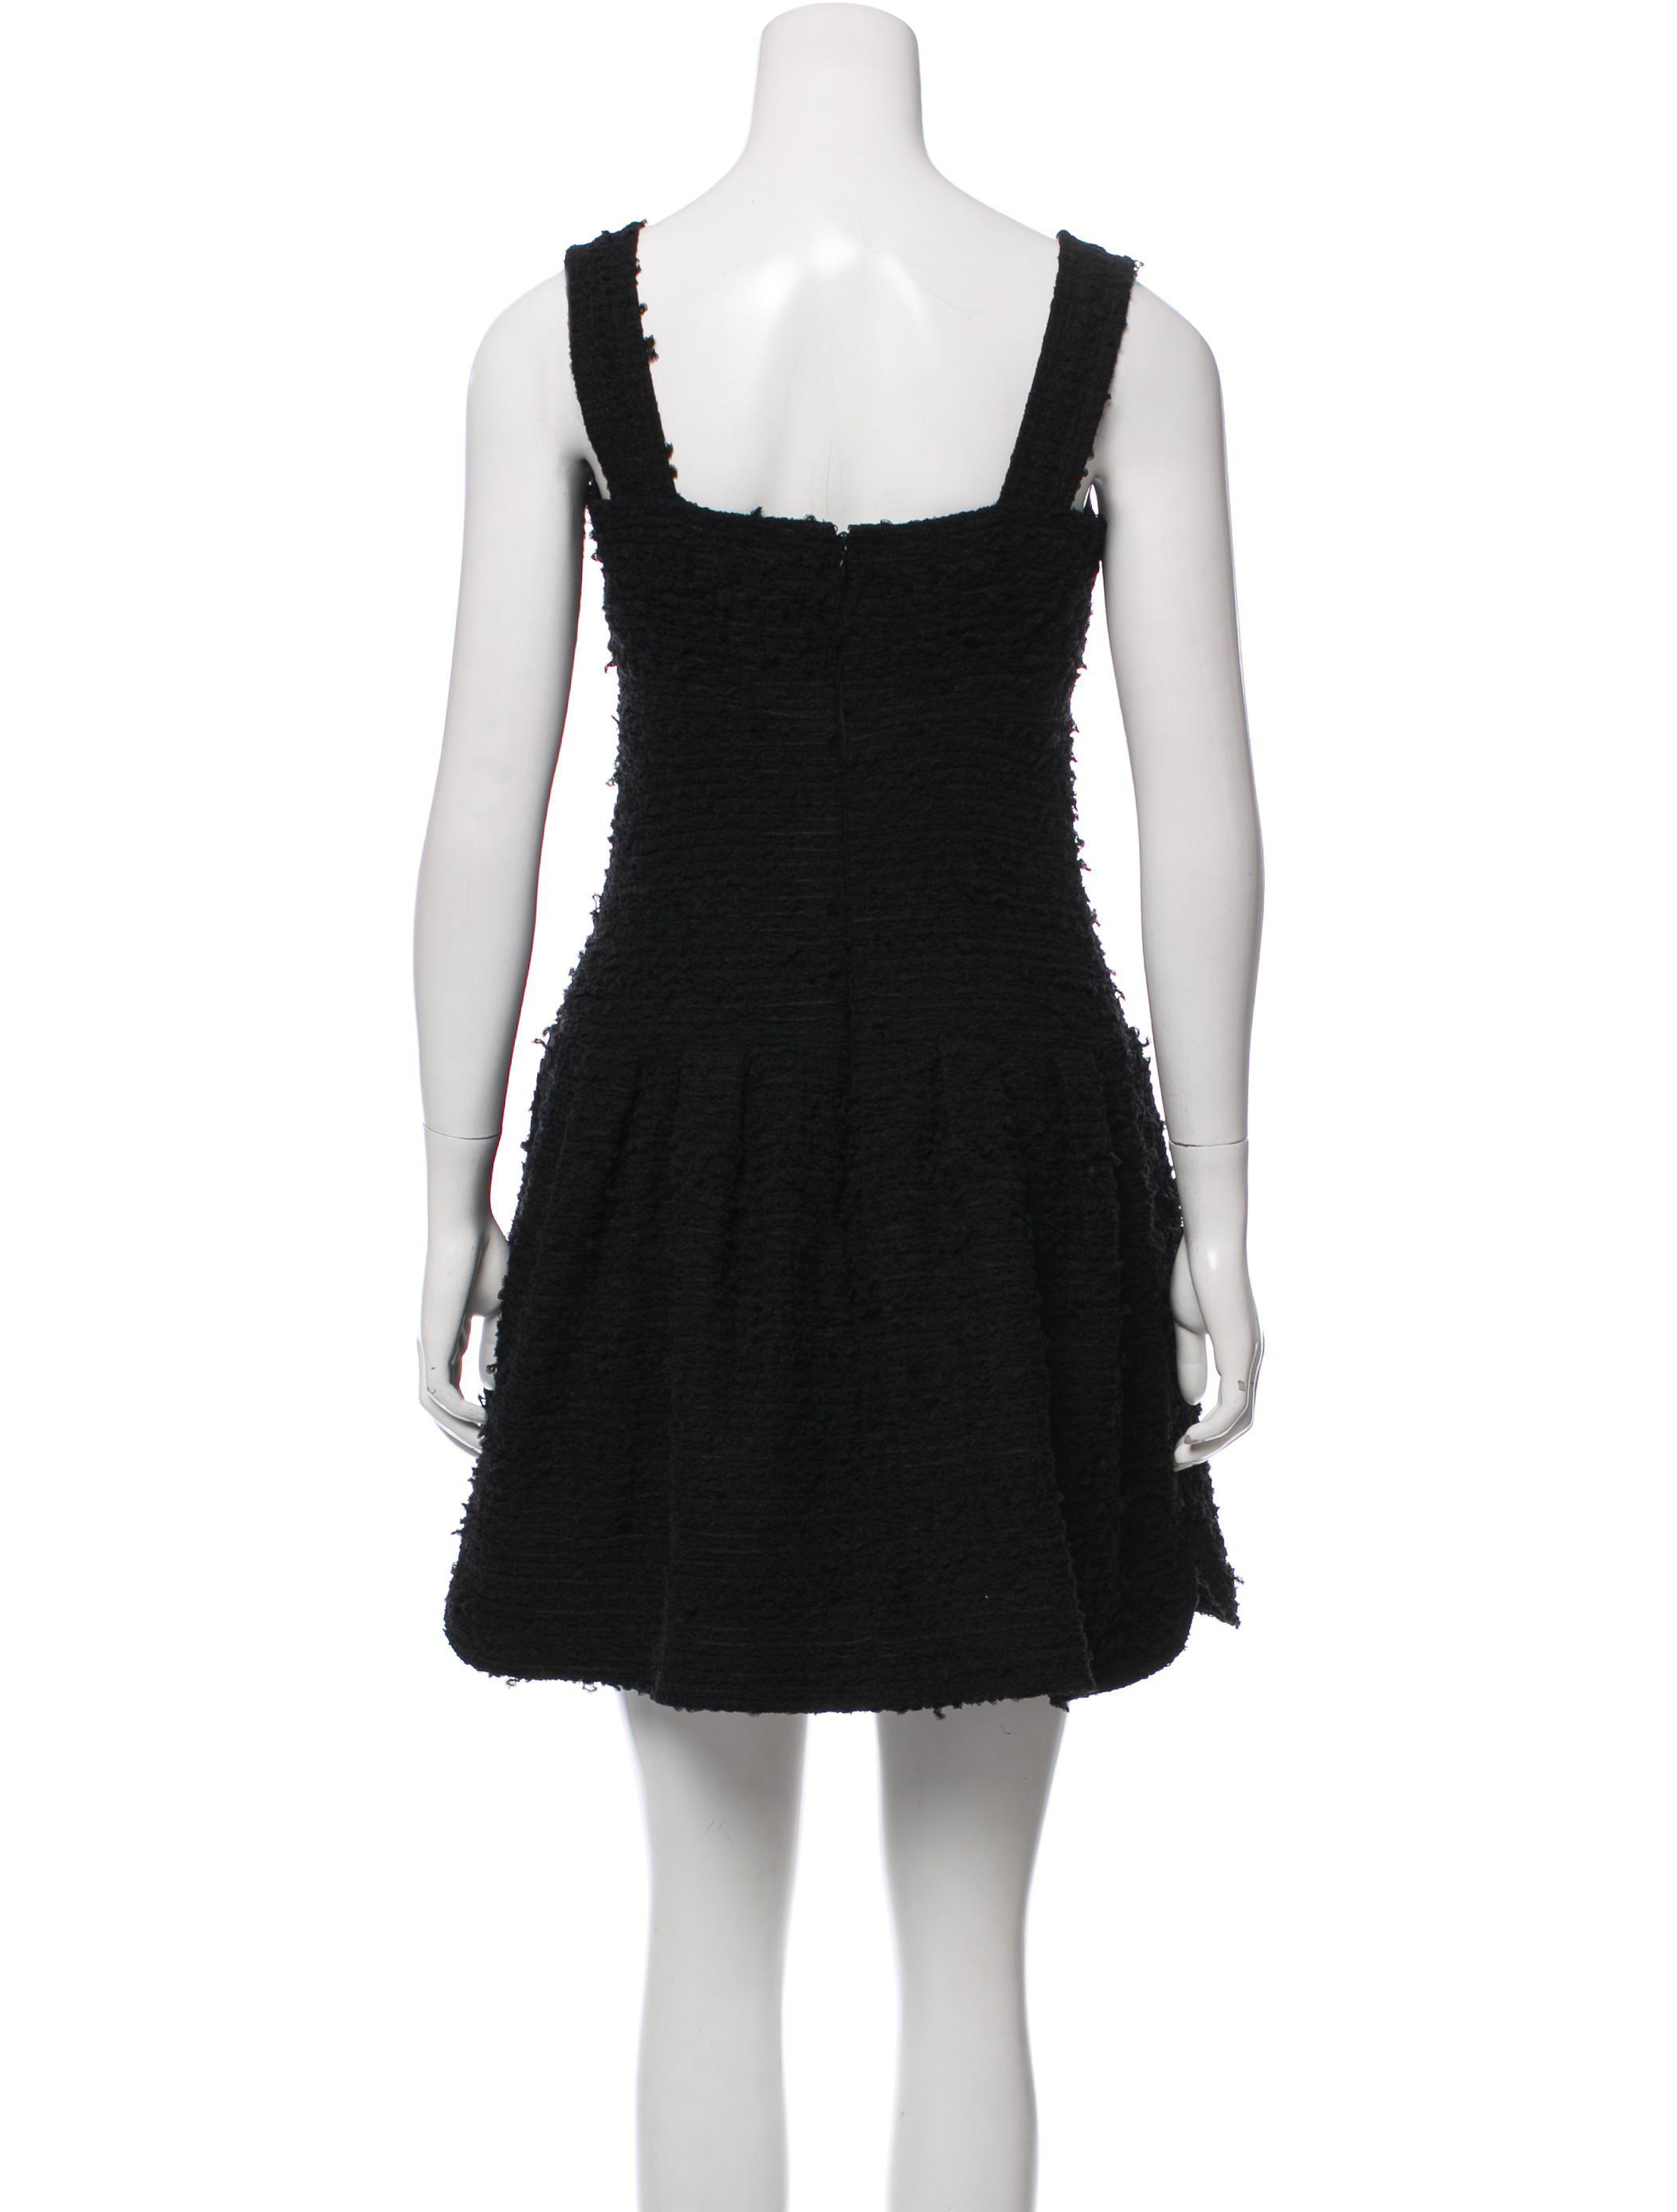 Chanel 2017 Fantasy Tweed Dress In Black